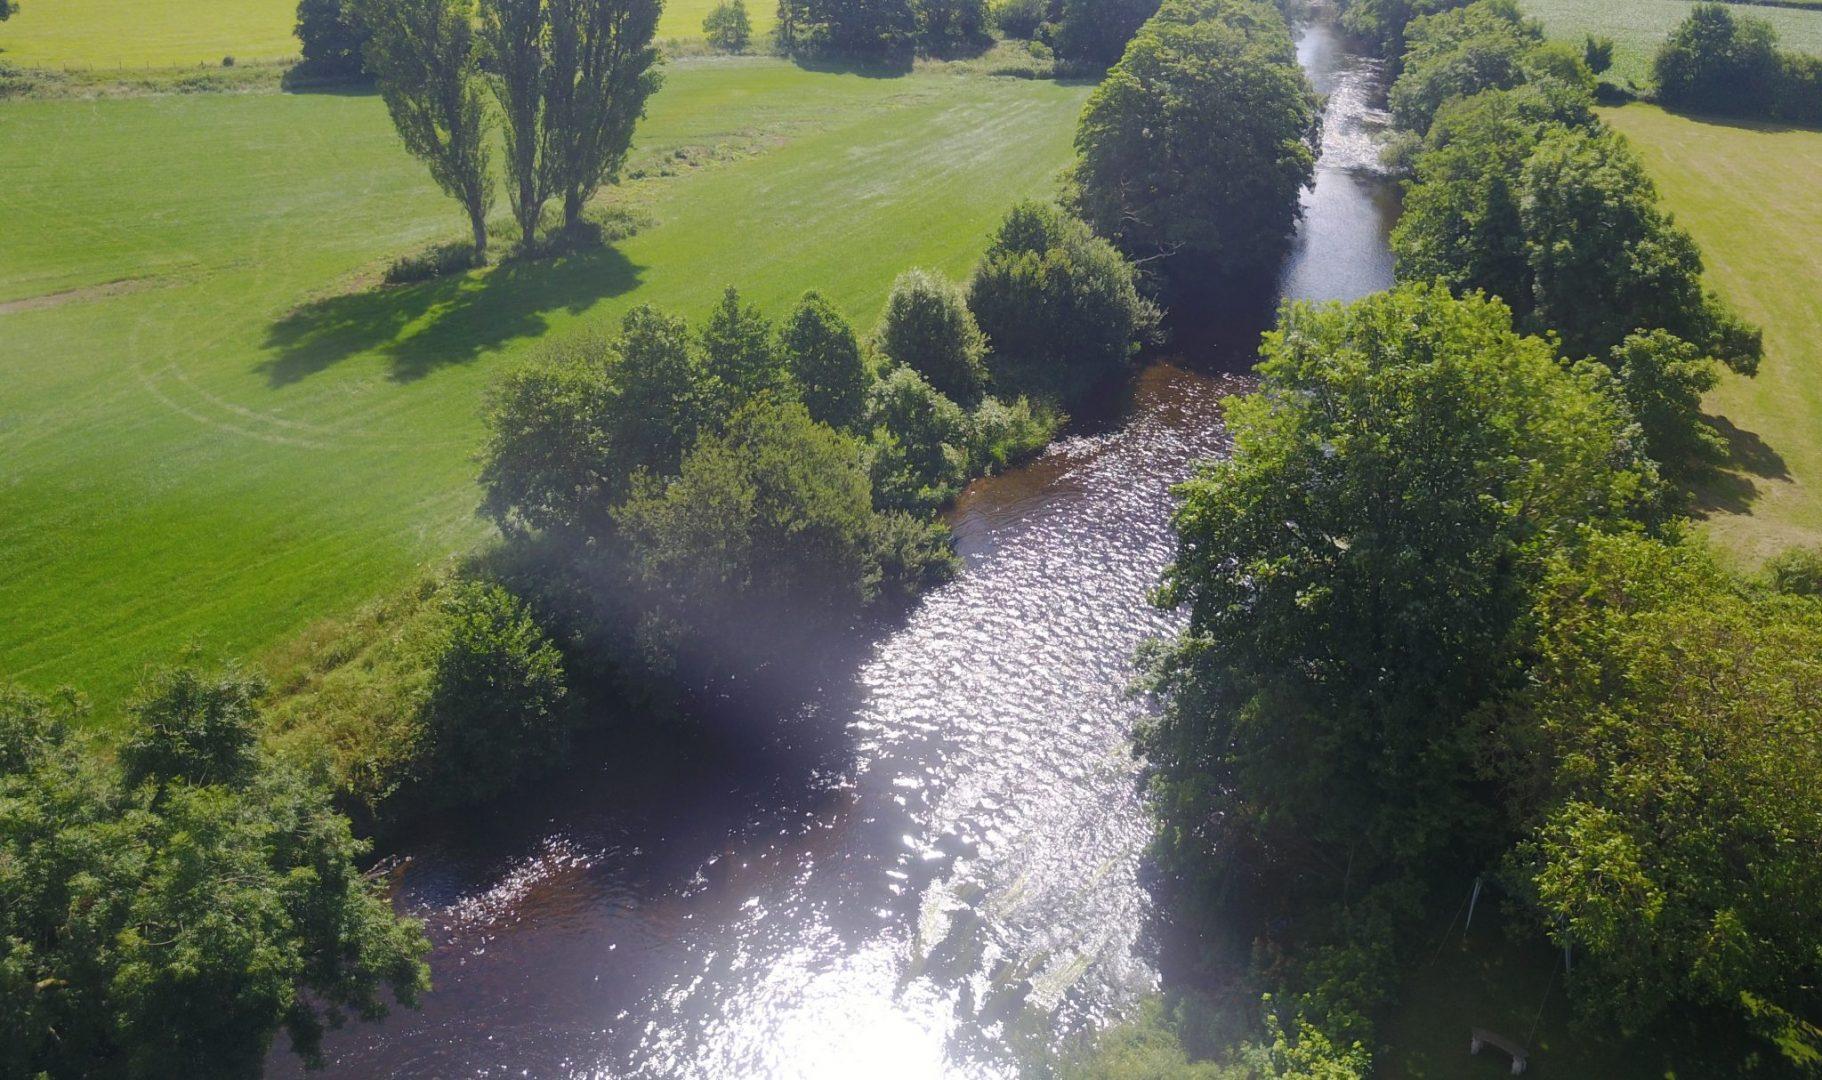 River flowing next to wedding venue